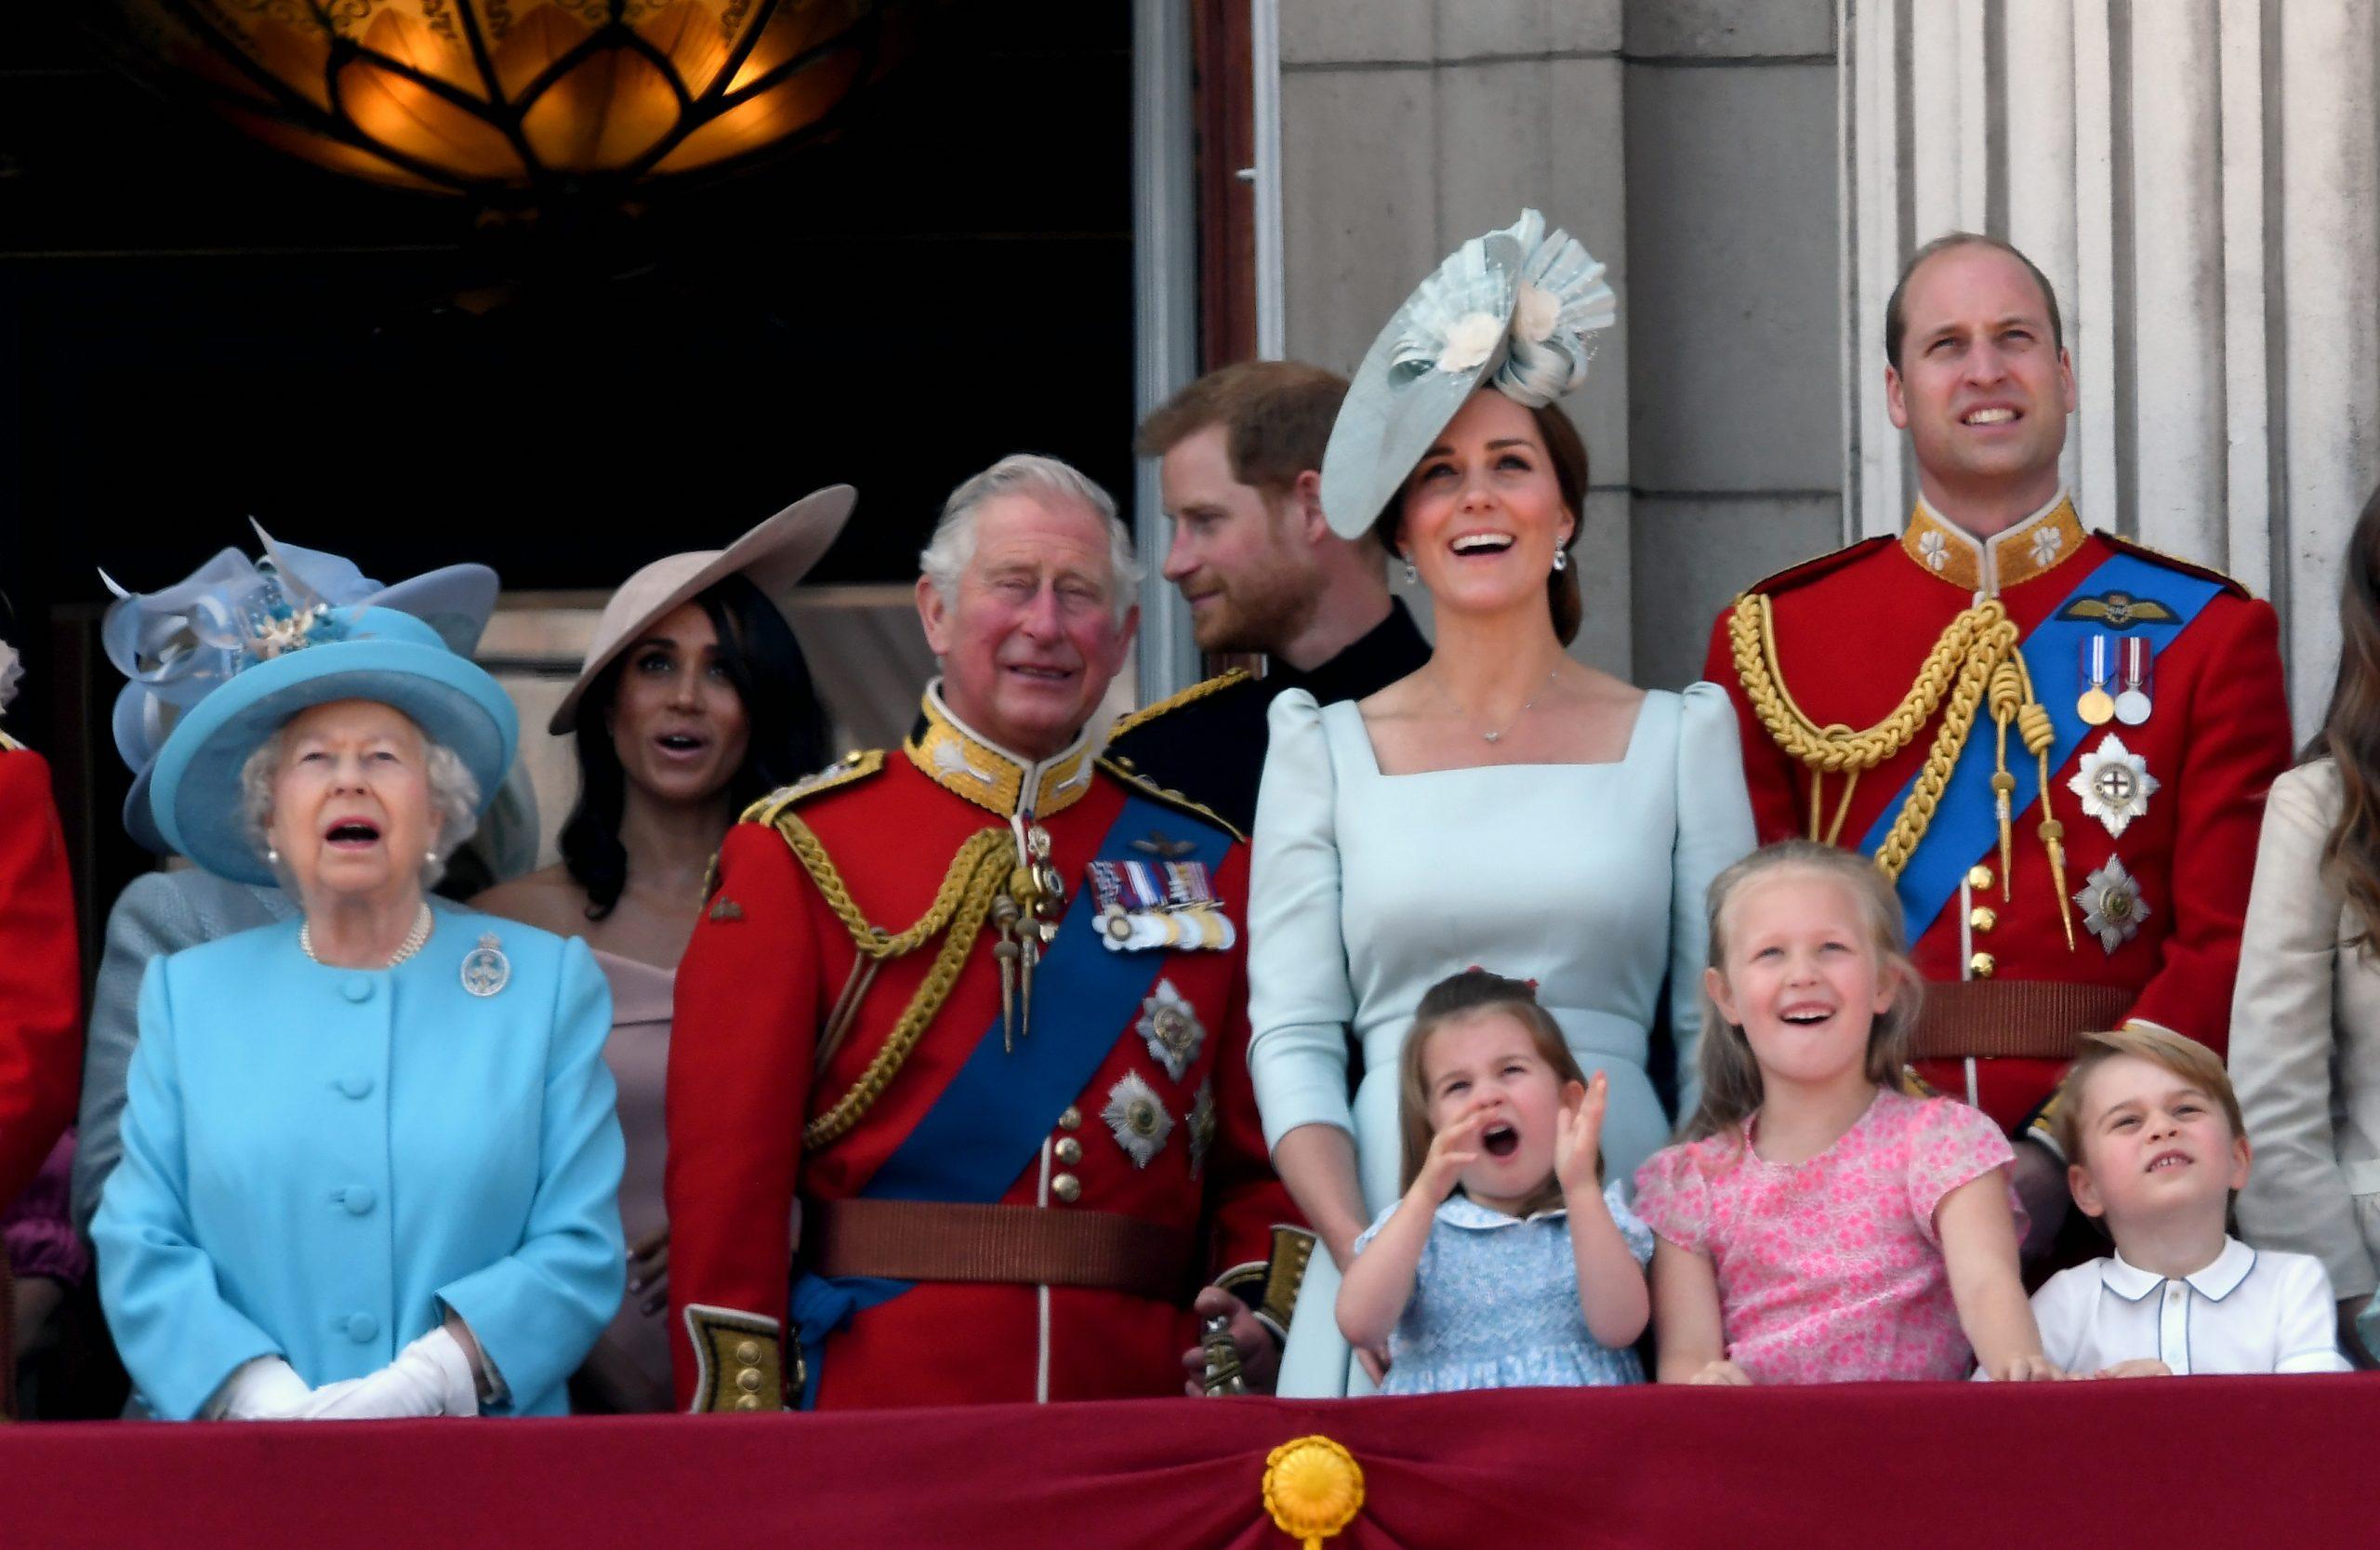 La reine, le prince Harry, Meghan Markle